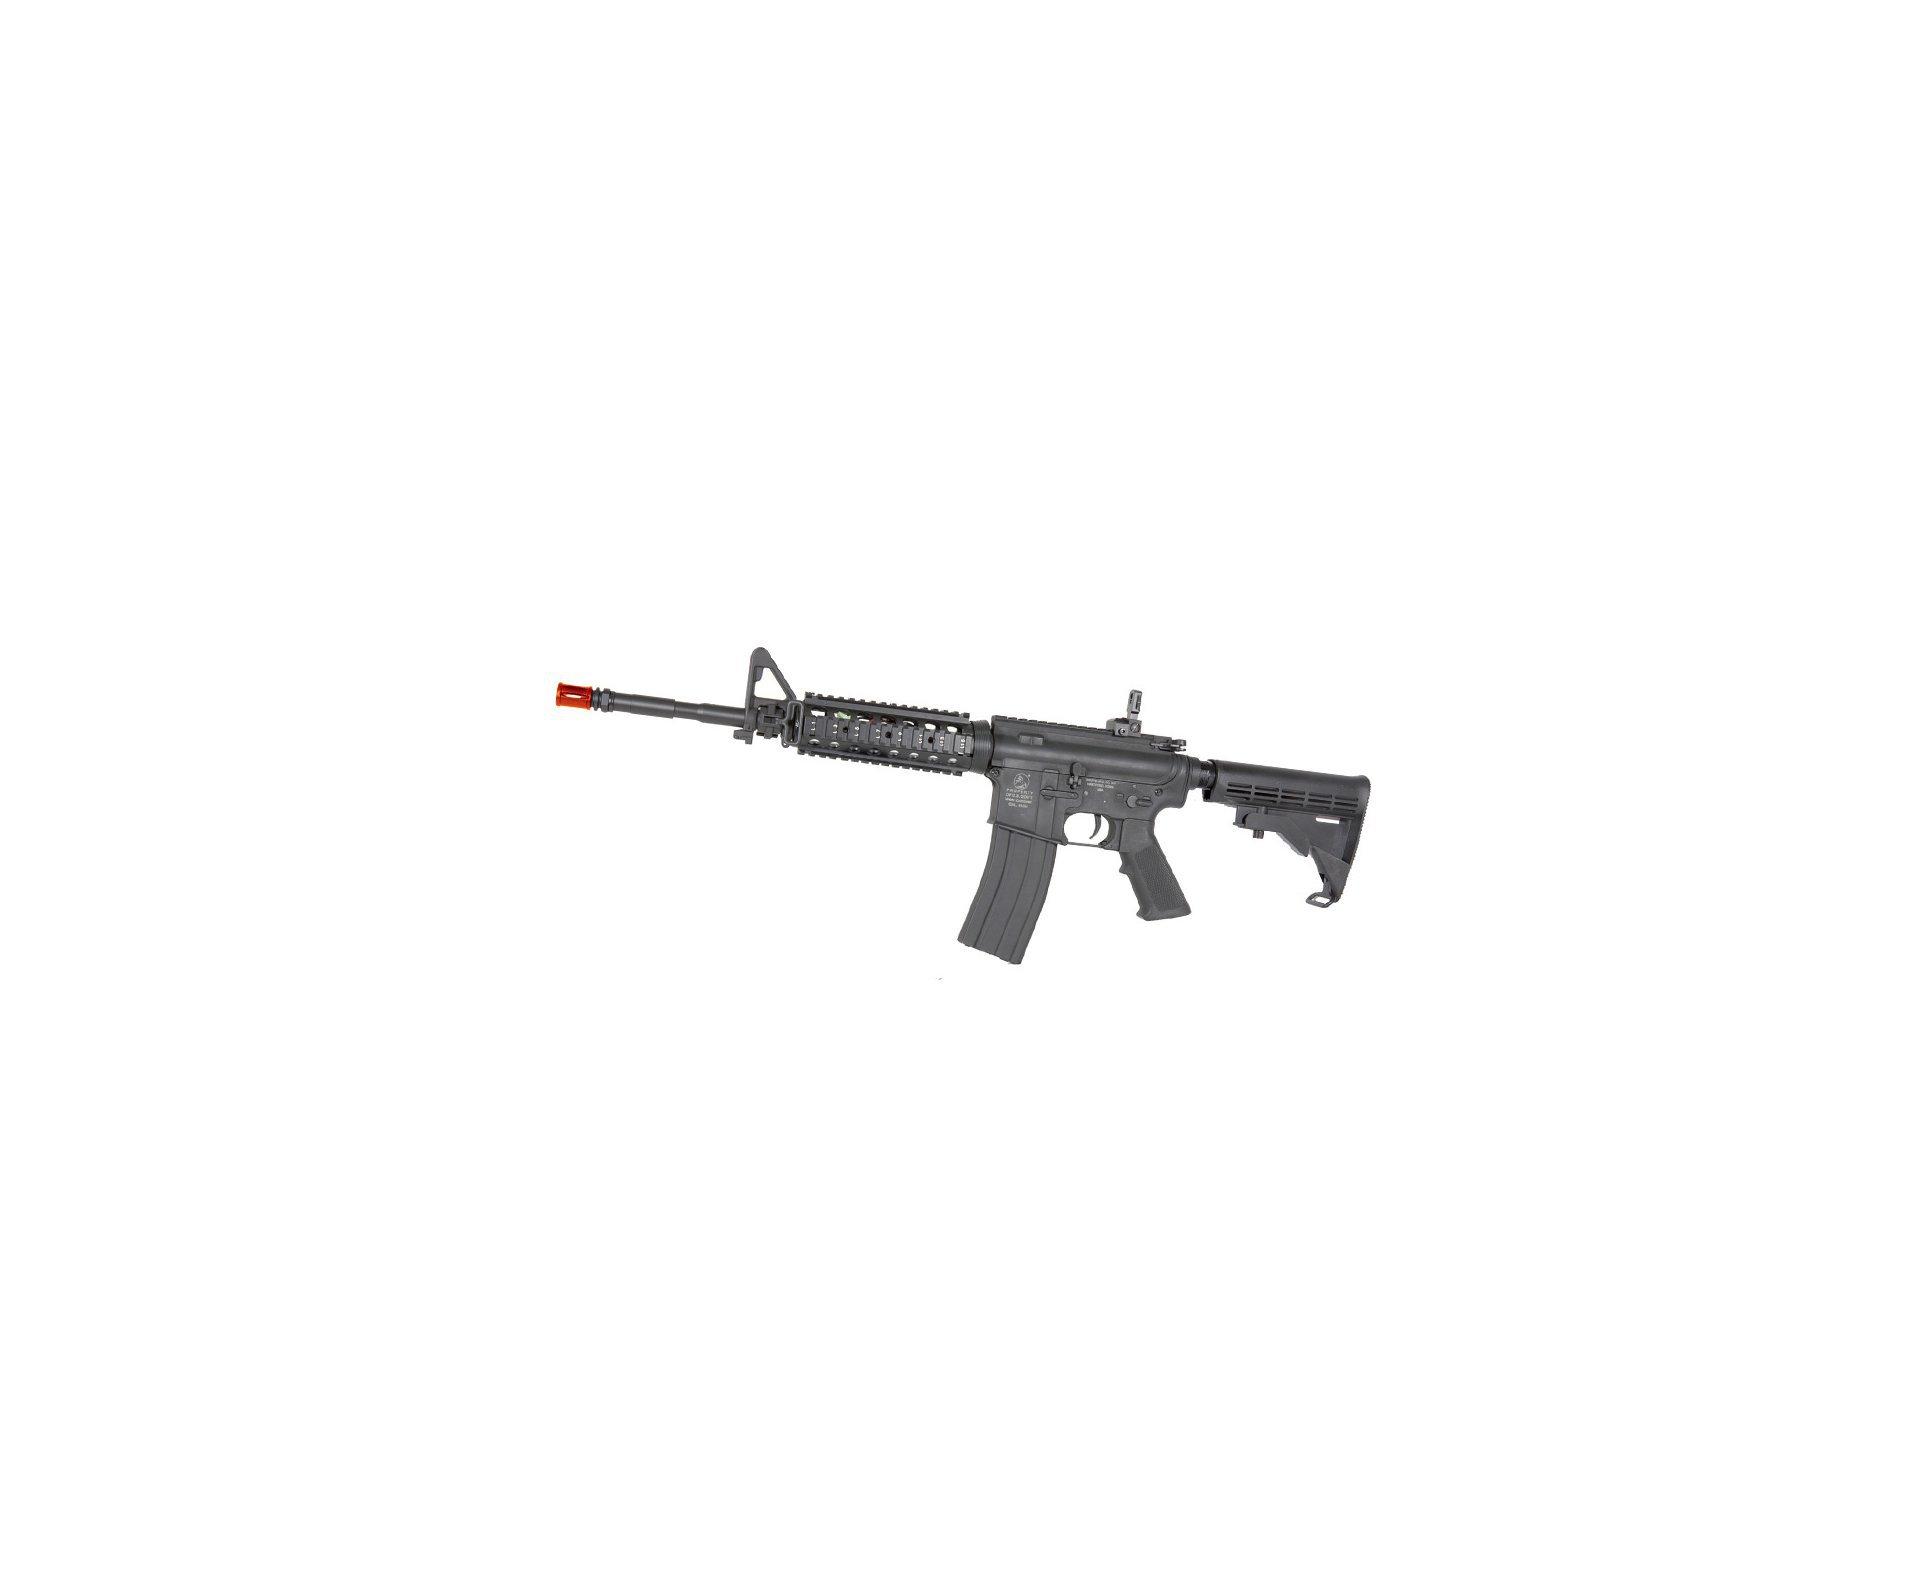 Rifle De Airsoft Colt M4 Ris - Full Metal - Cal 6,0 Mm - Cyber Gun